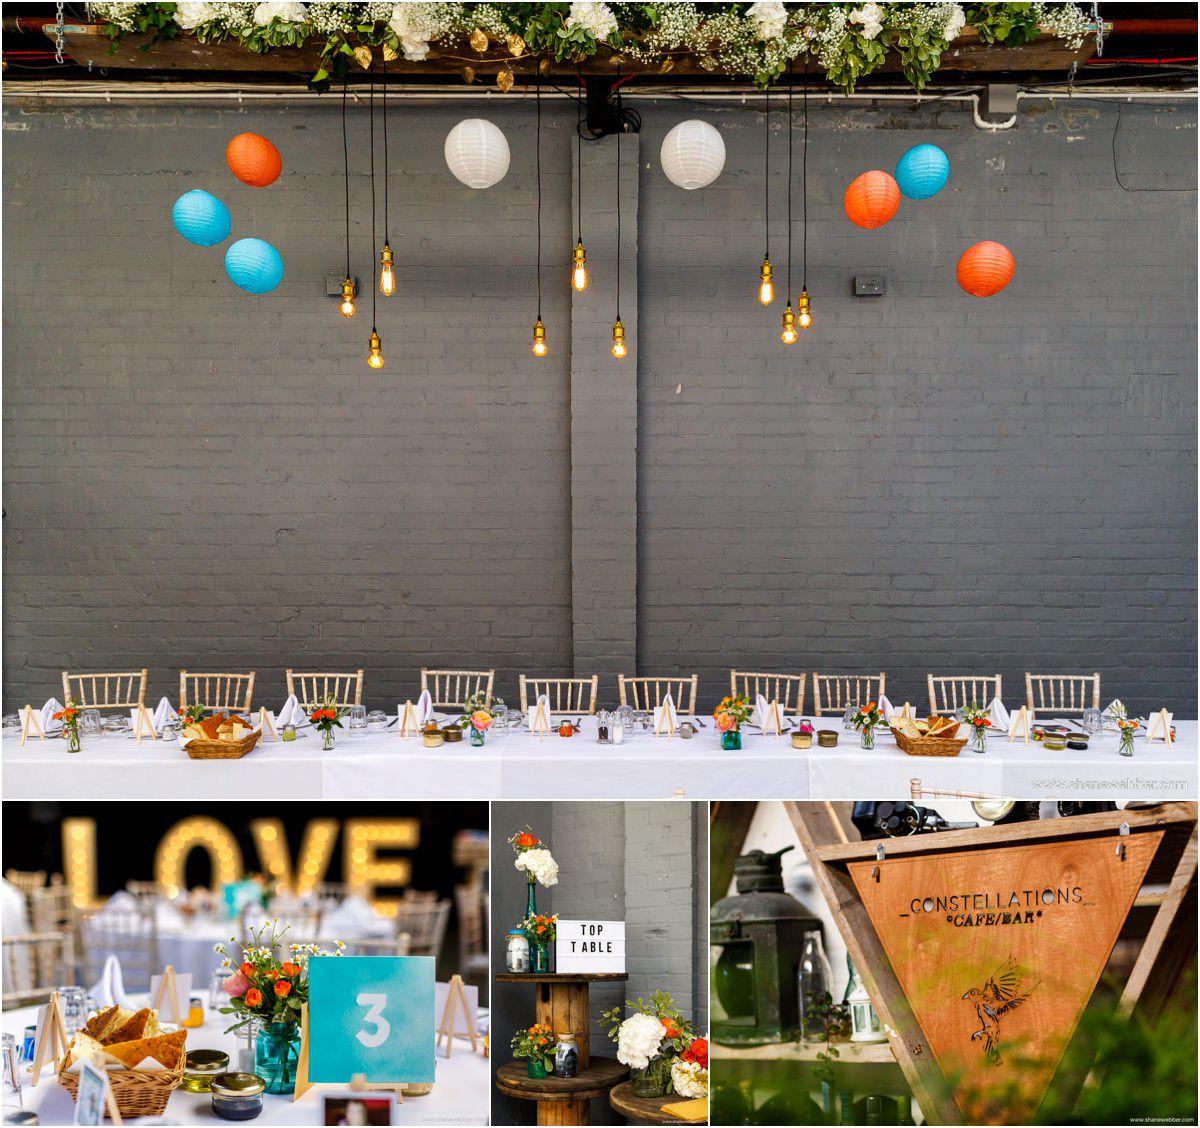 Top table wedding inspiration